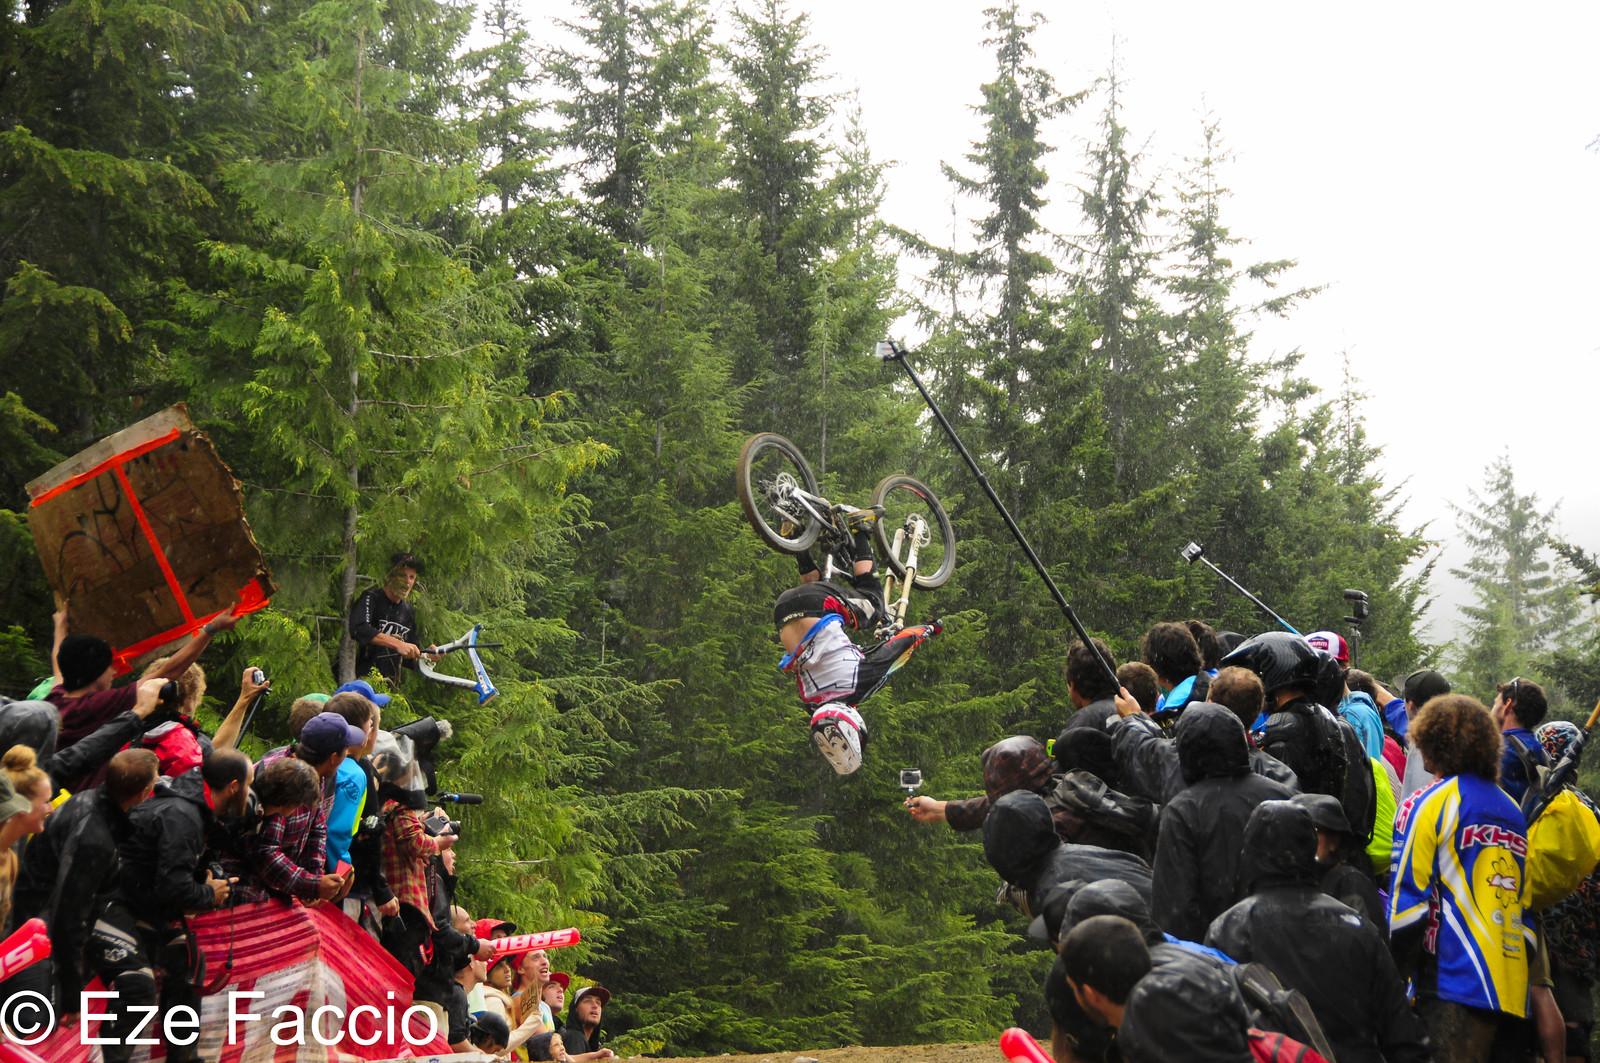 Backflip... not whip - ezefaccio - Mountain Biking Pictures - Vital MTB